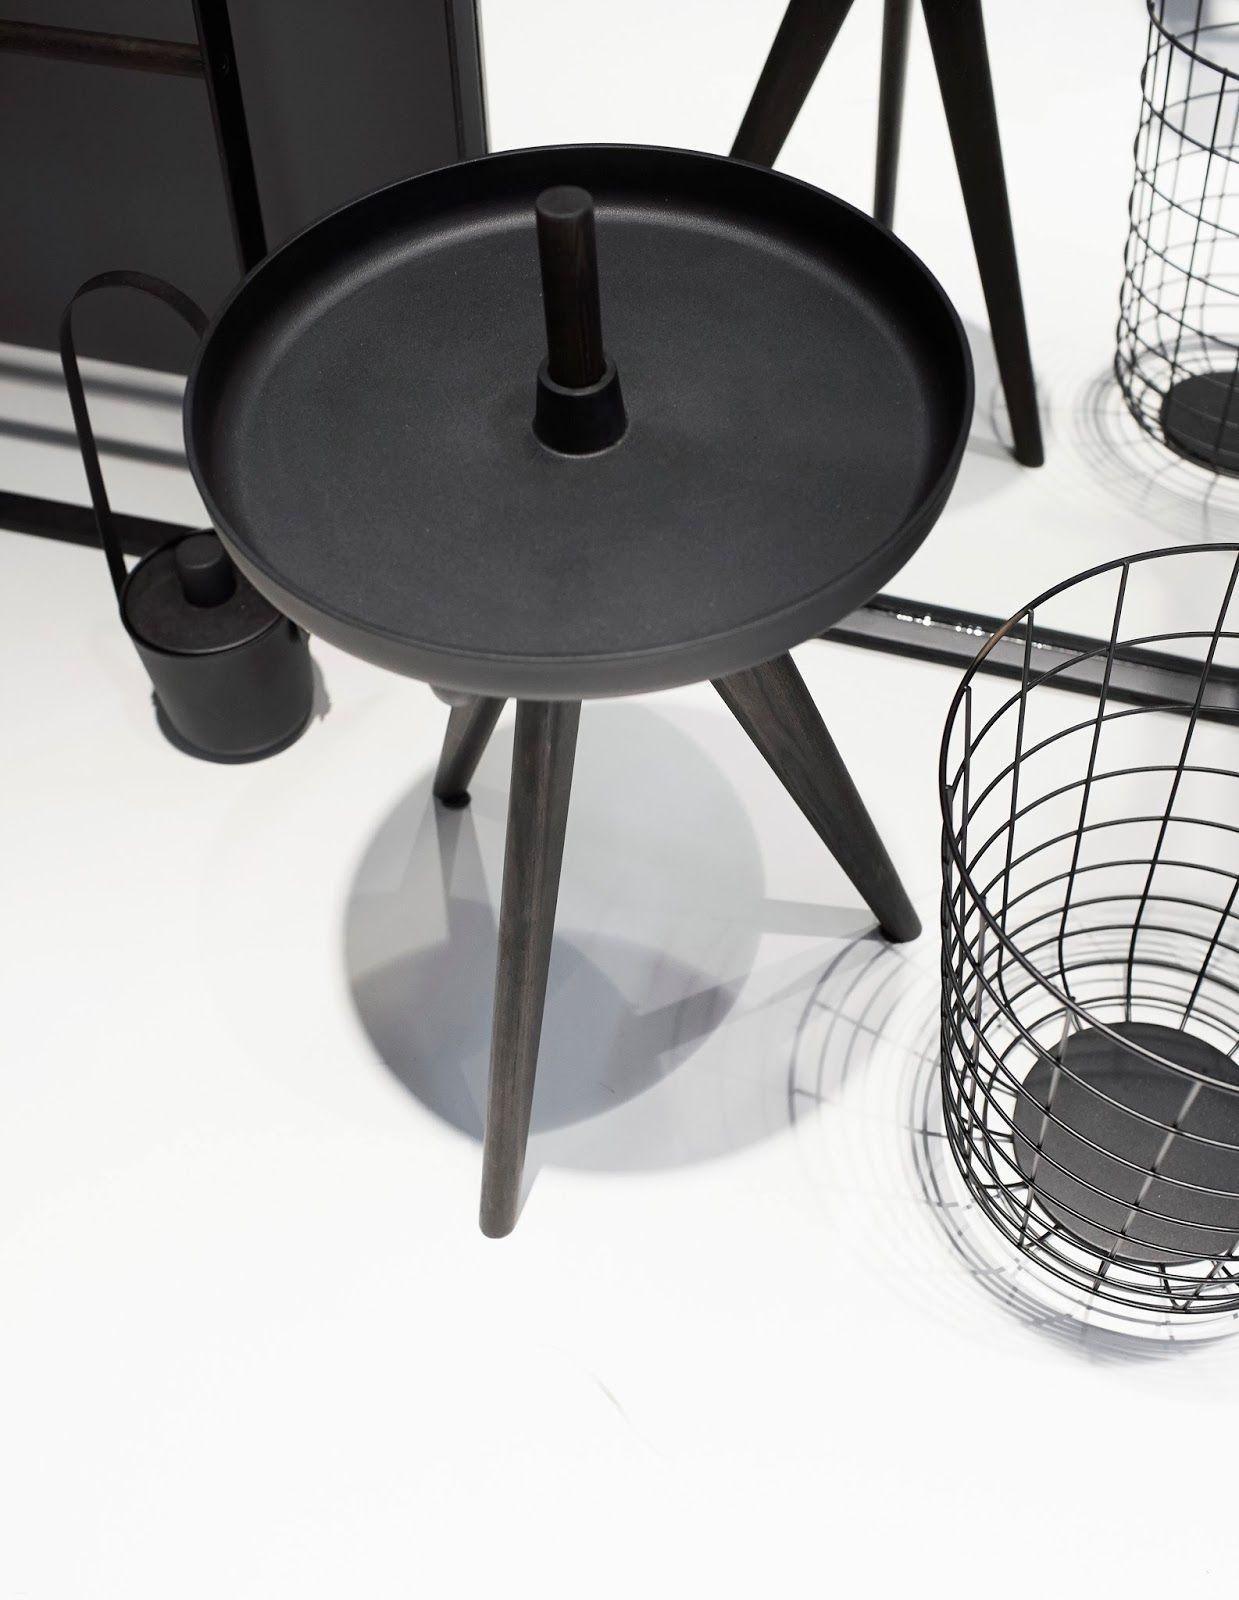 Side Table and Waste Paper Basket - Stockholm Furniture Fair 2014